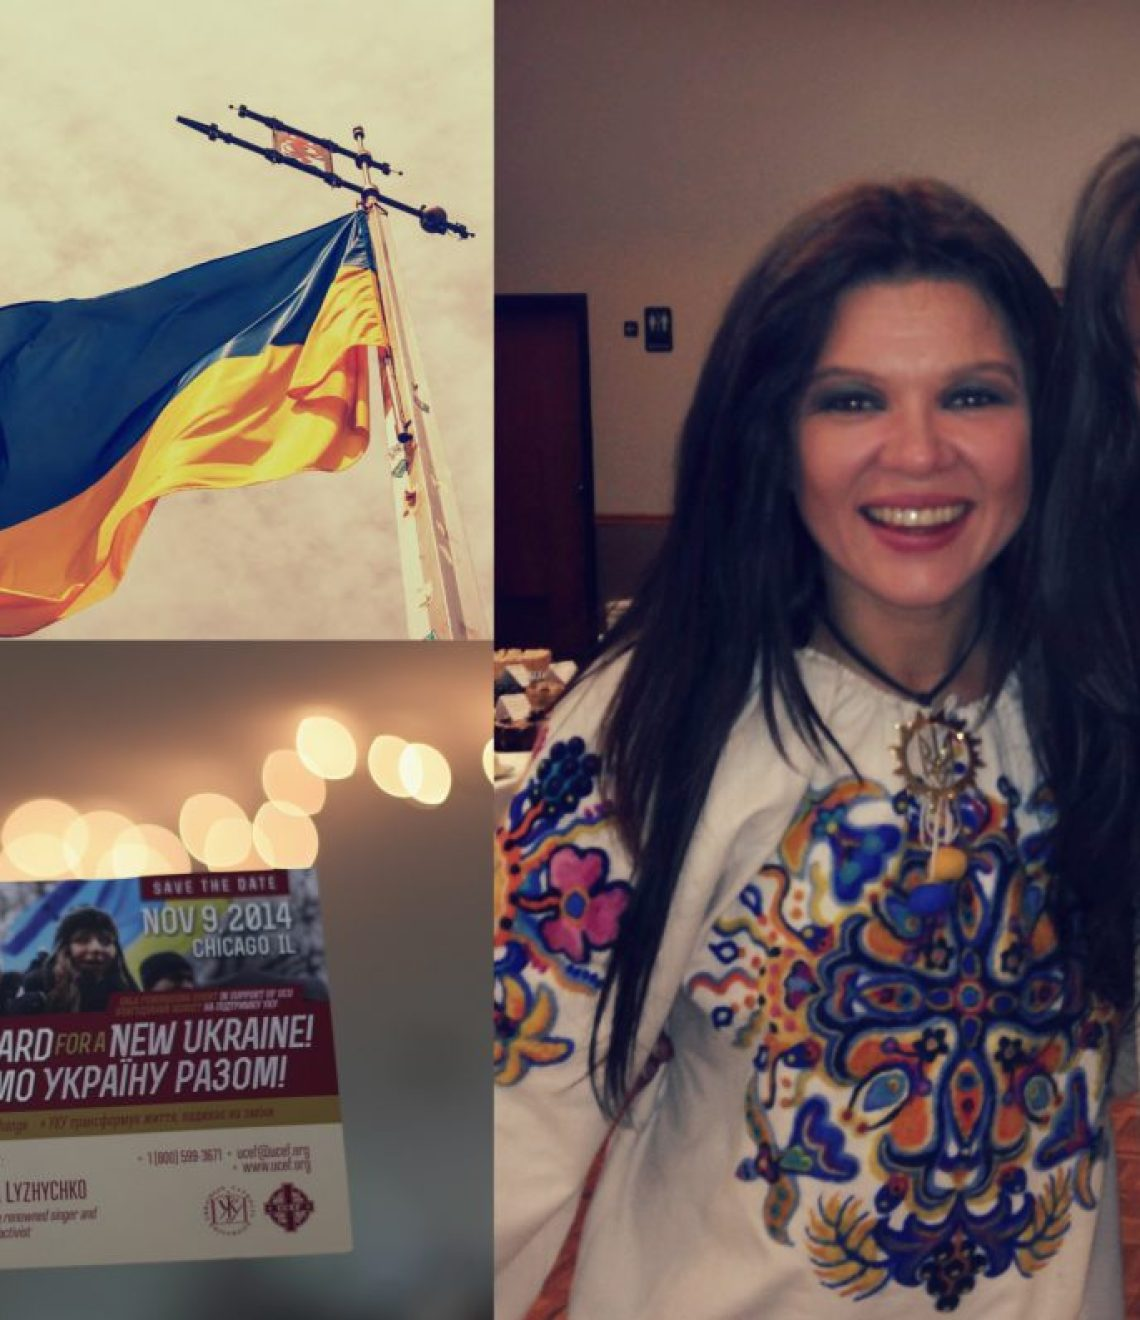 Ukrainian Catholic University Benefit Chicago Ruslana Lyzhychko Maidan Anagrassia